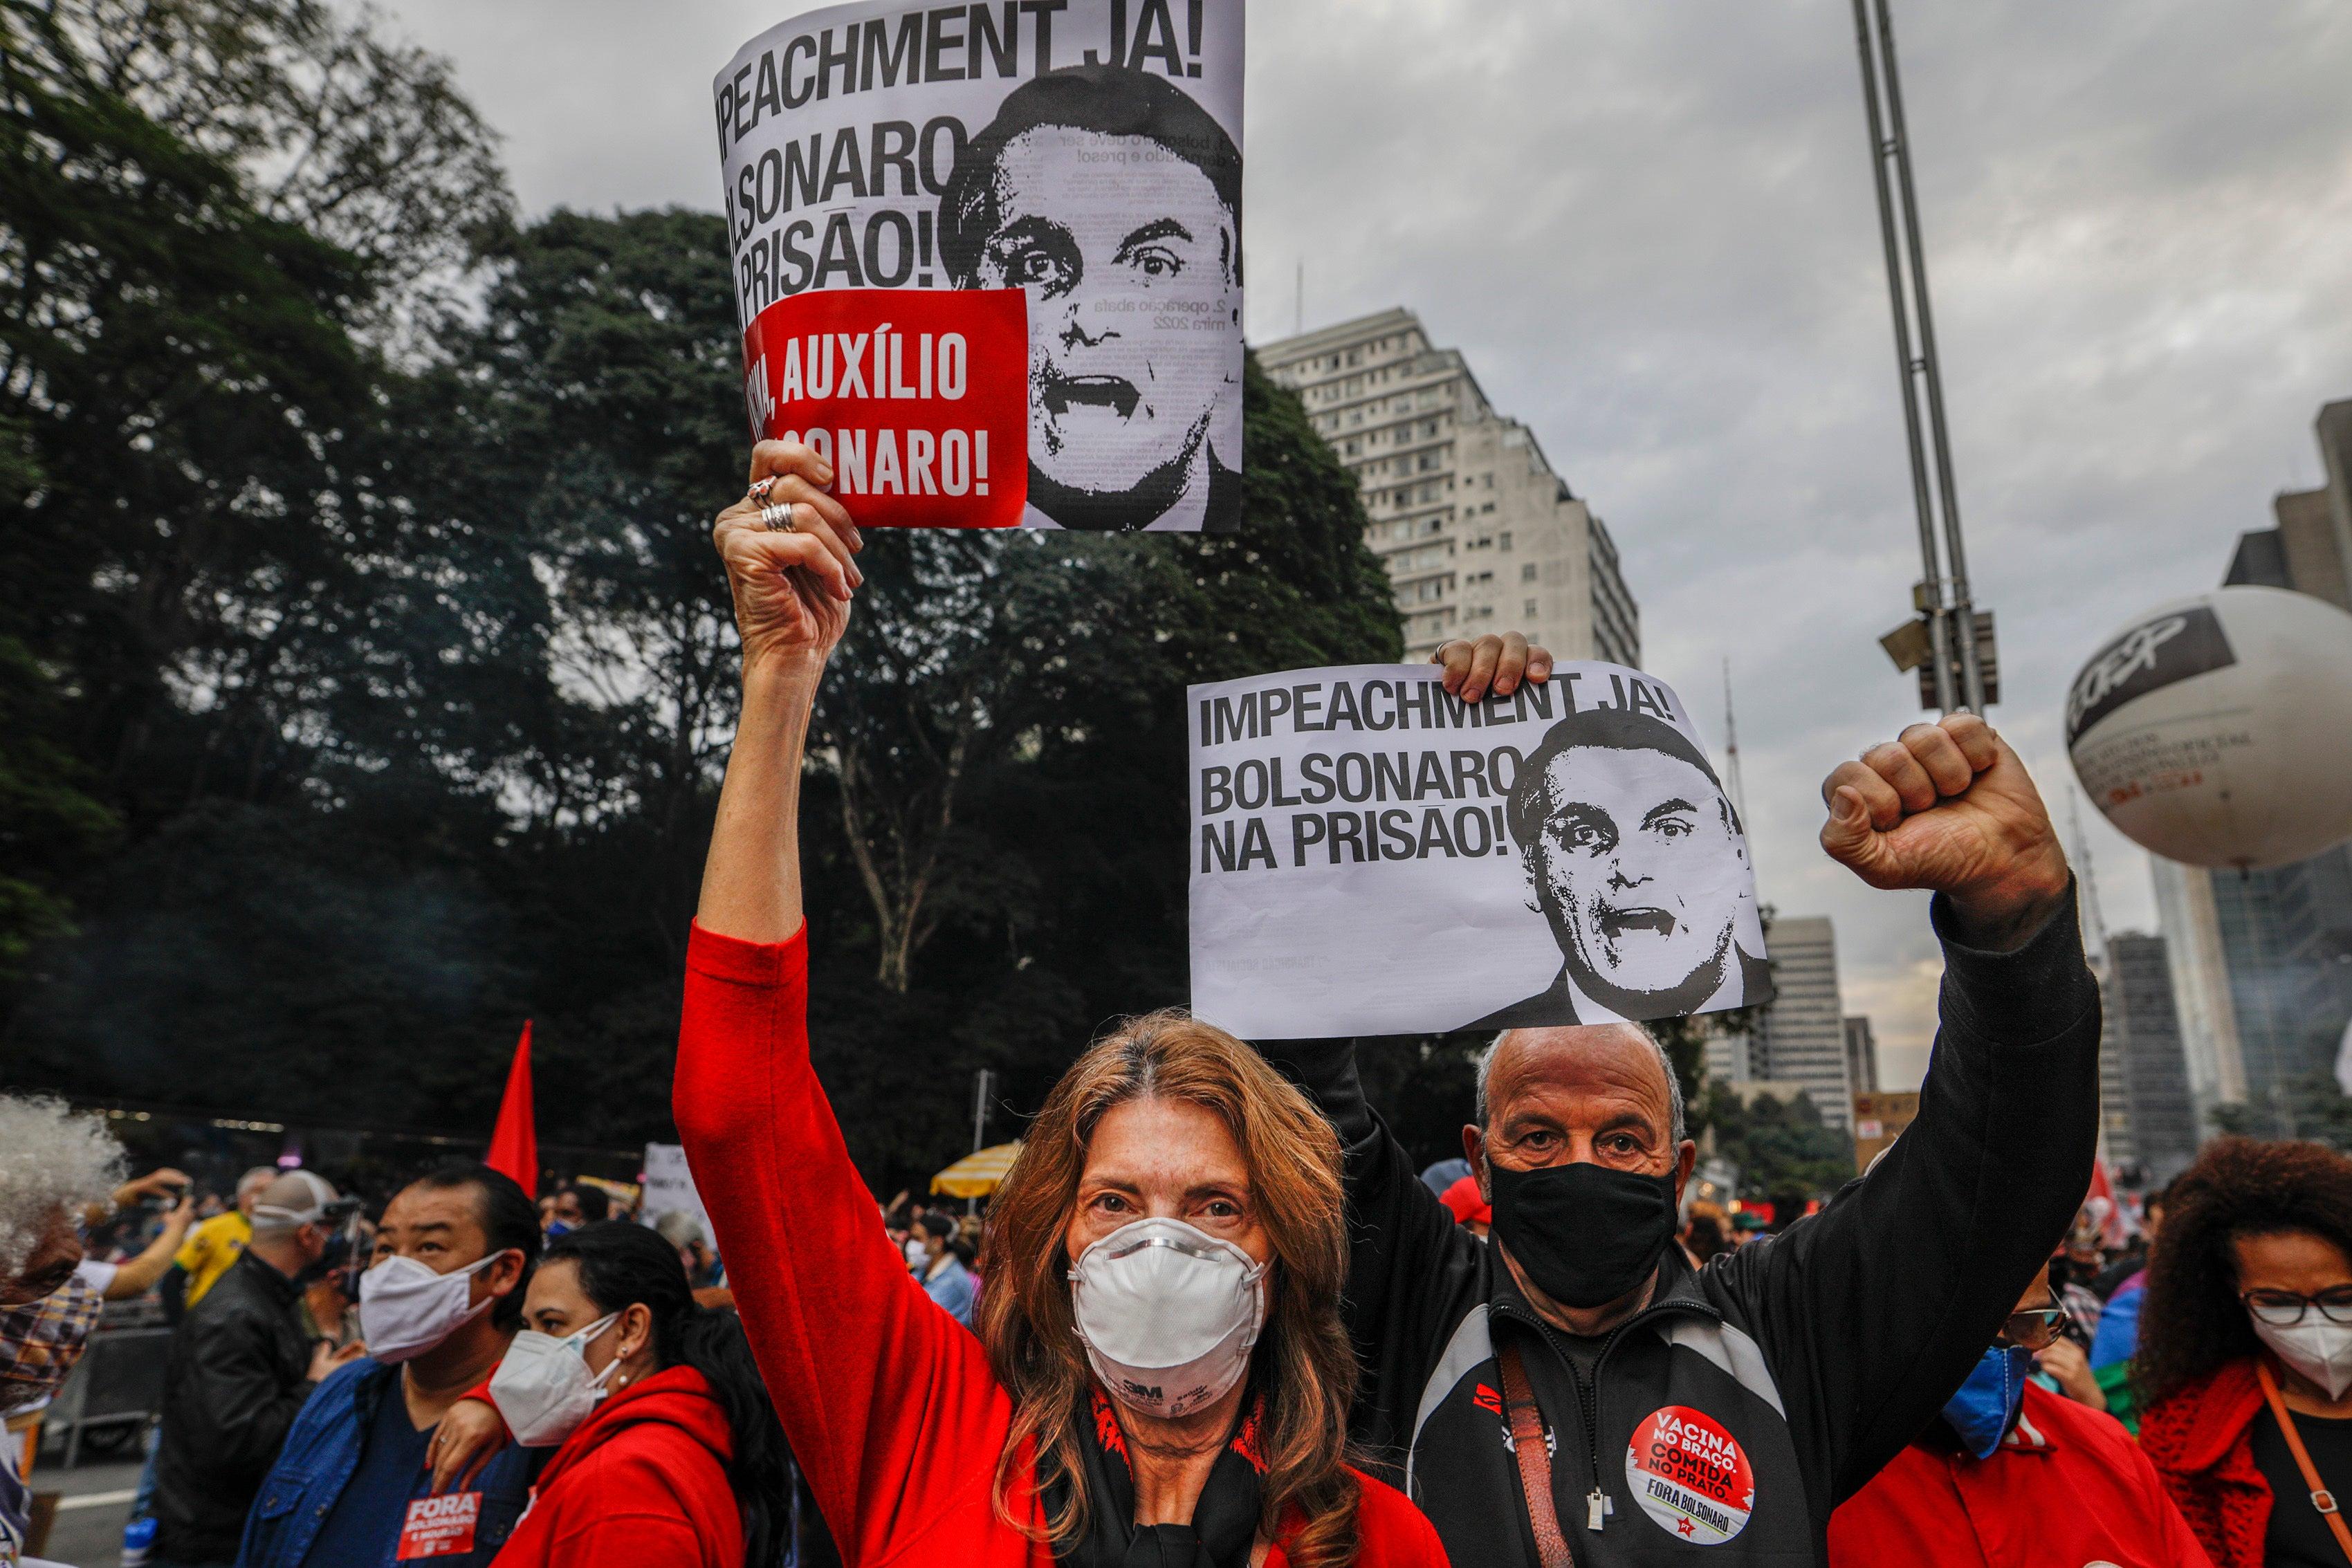 As Brazil tops 500K COVID-19 deaths, protests rage against President Jair Bolsonaro - fox